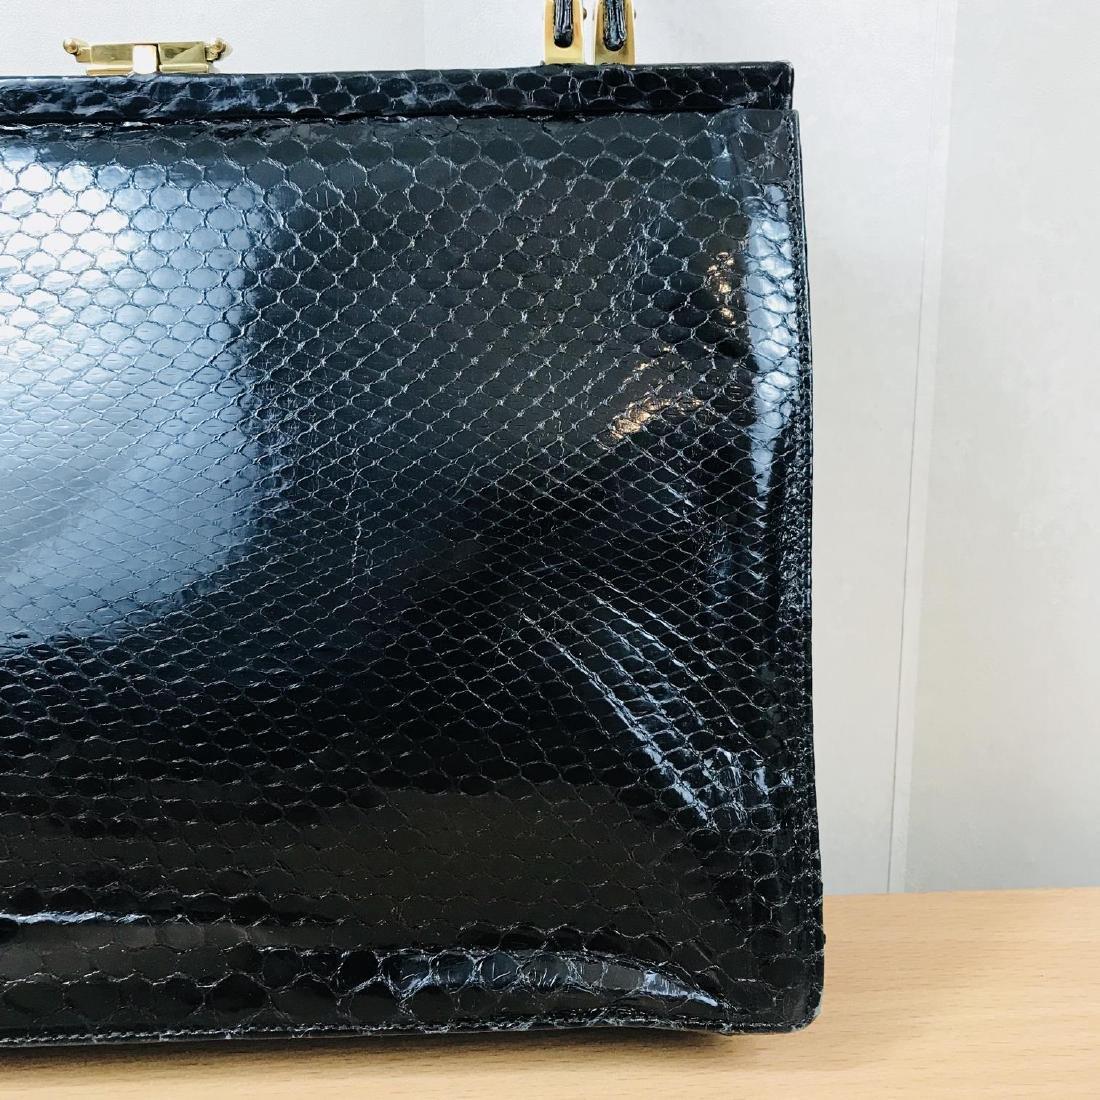 Vintage Black Snakeskin Leather Handbag - 2